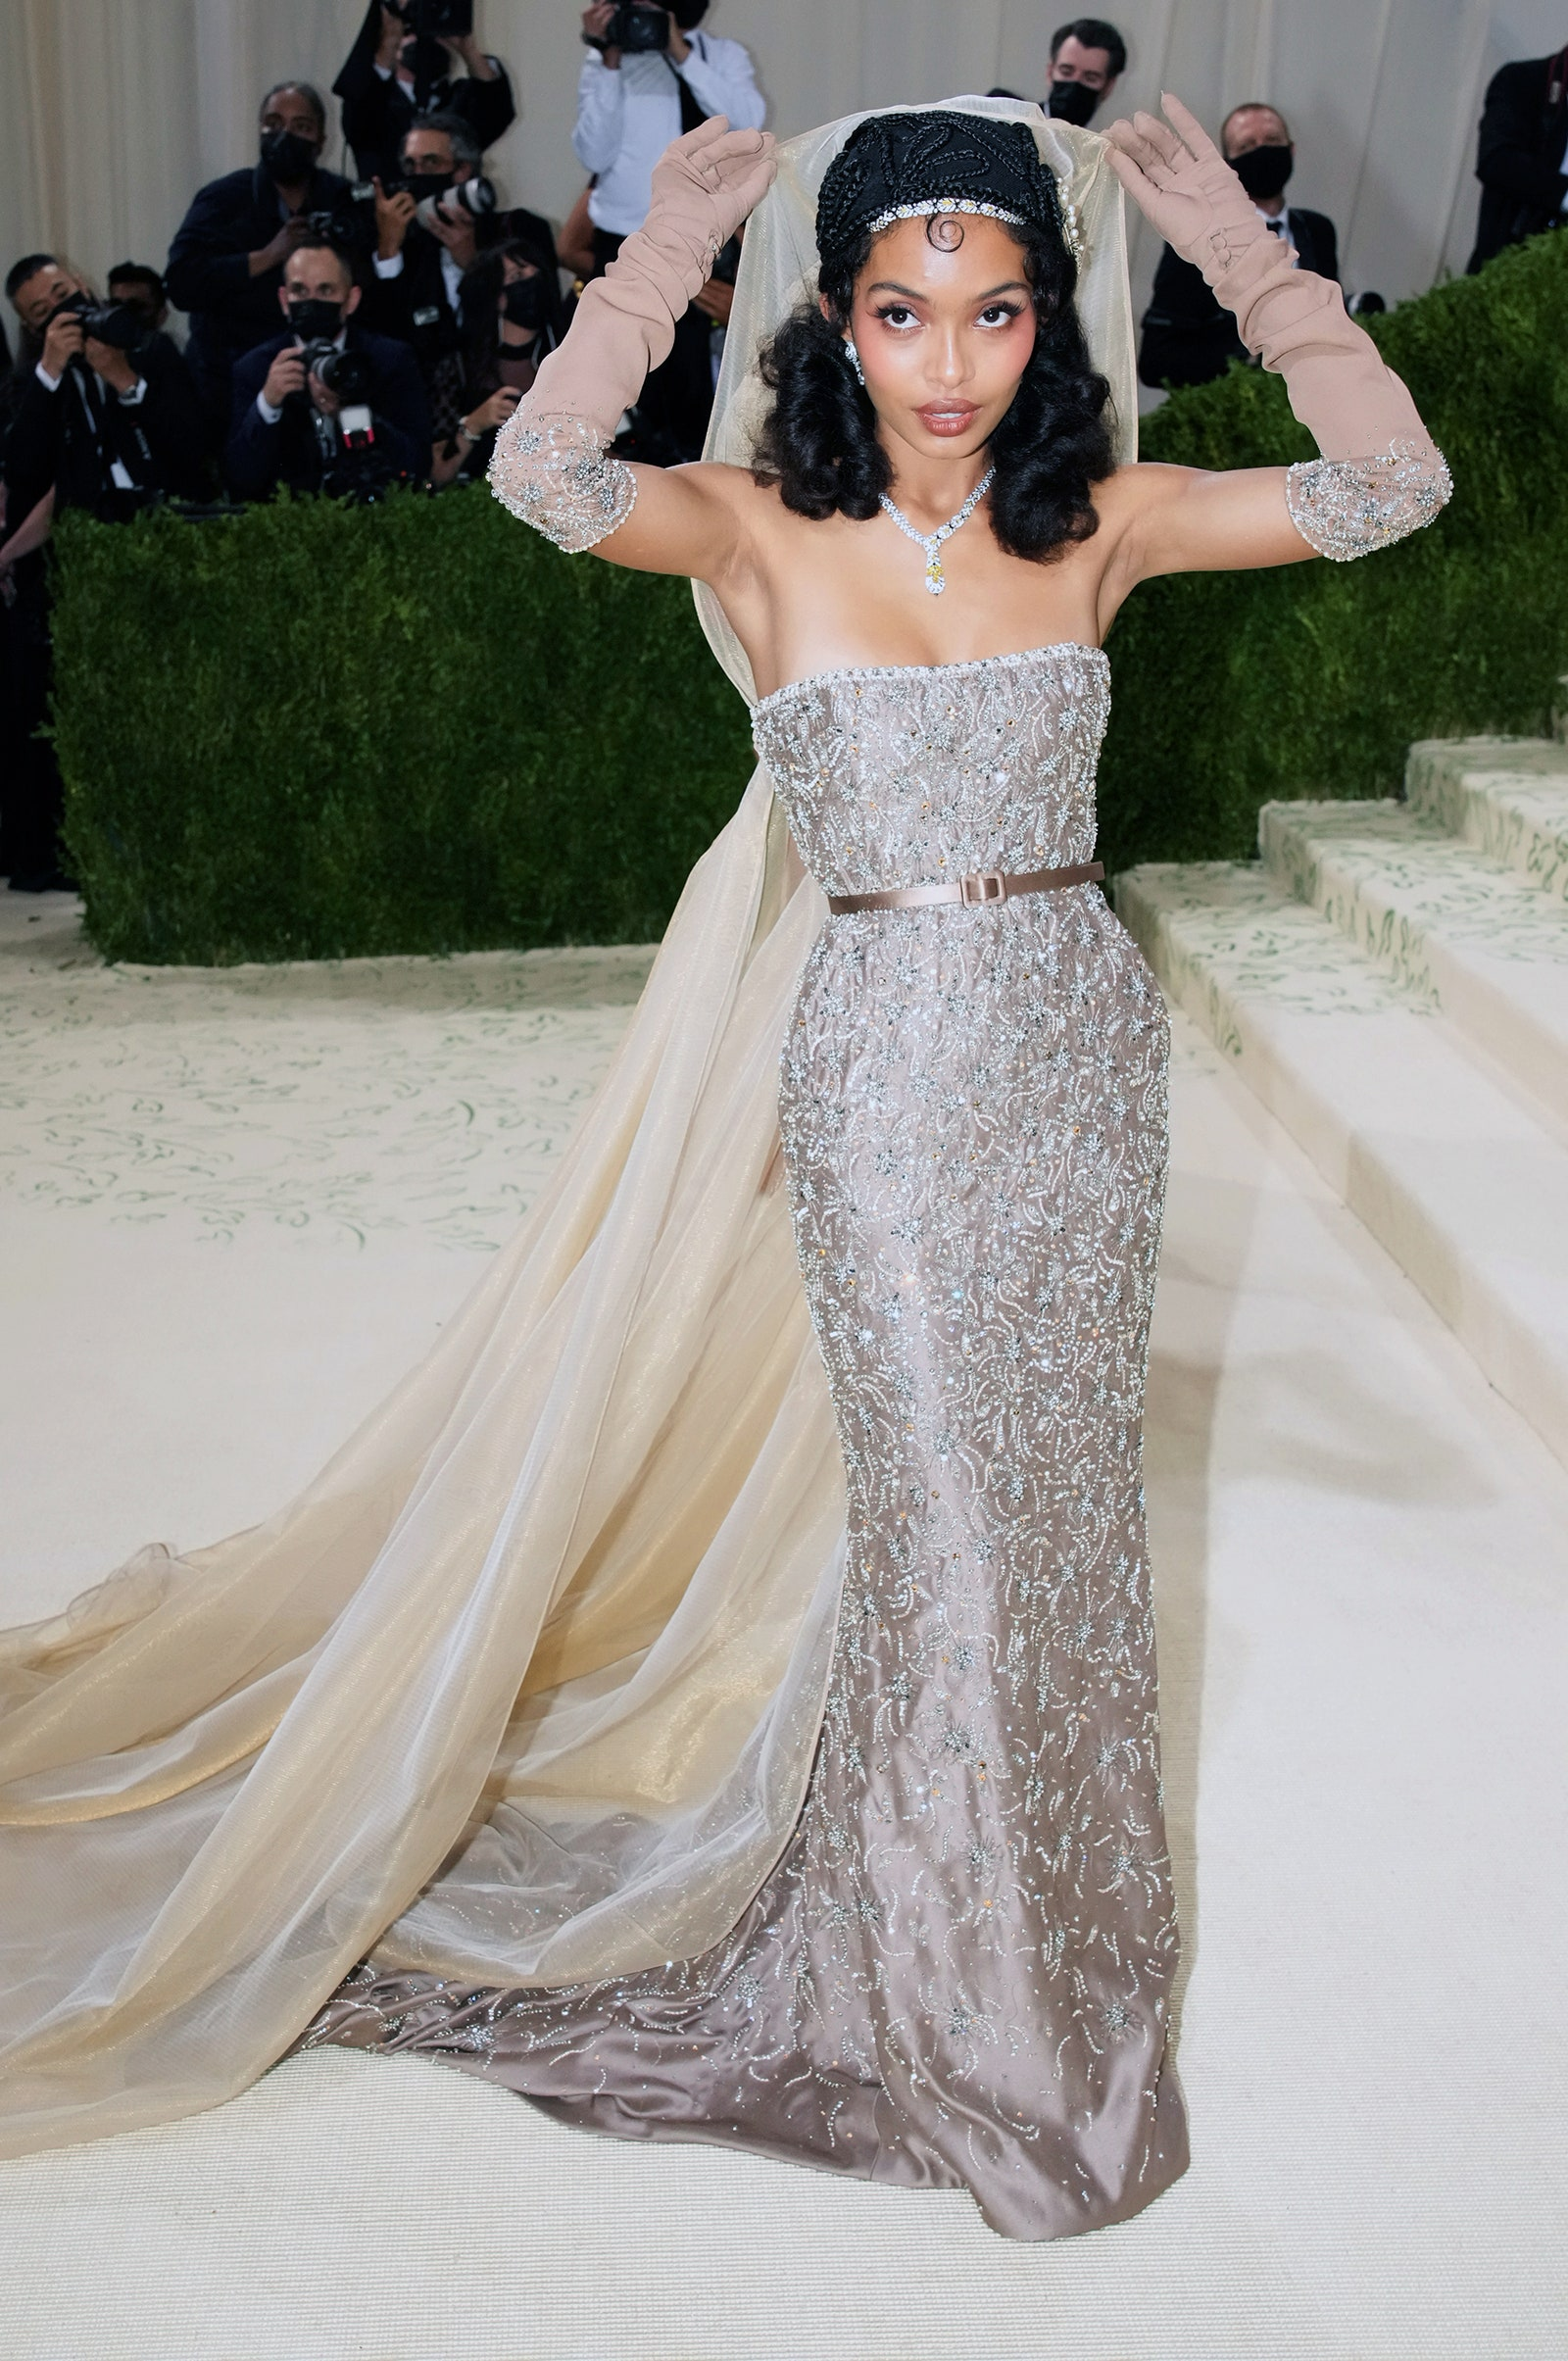 Yara Shahidi in a Christian Dior gown at the Met Gala.